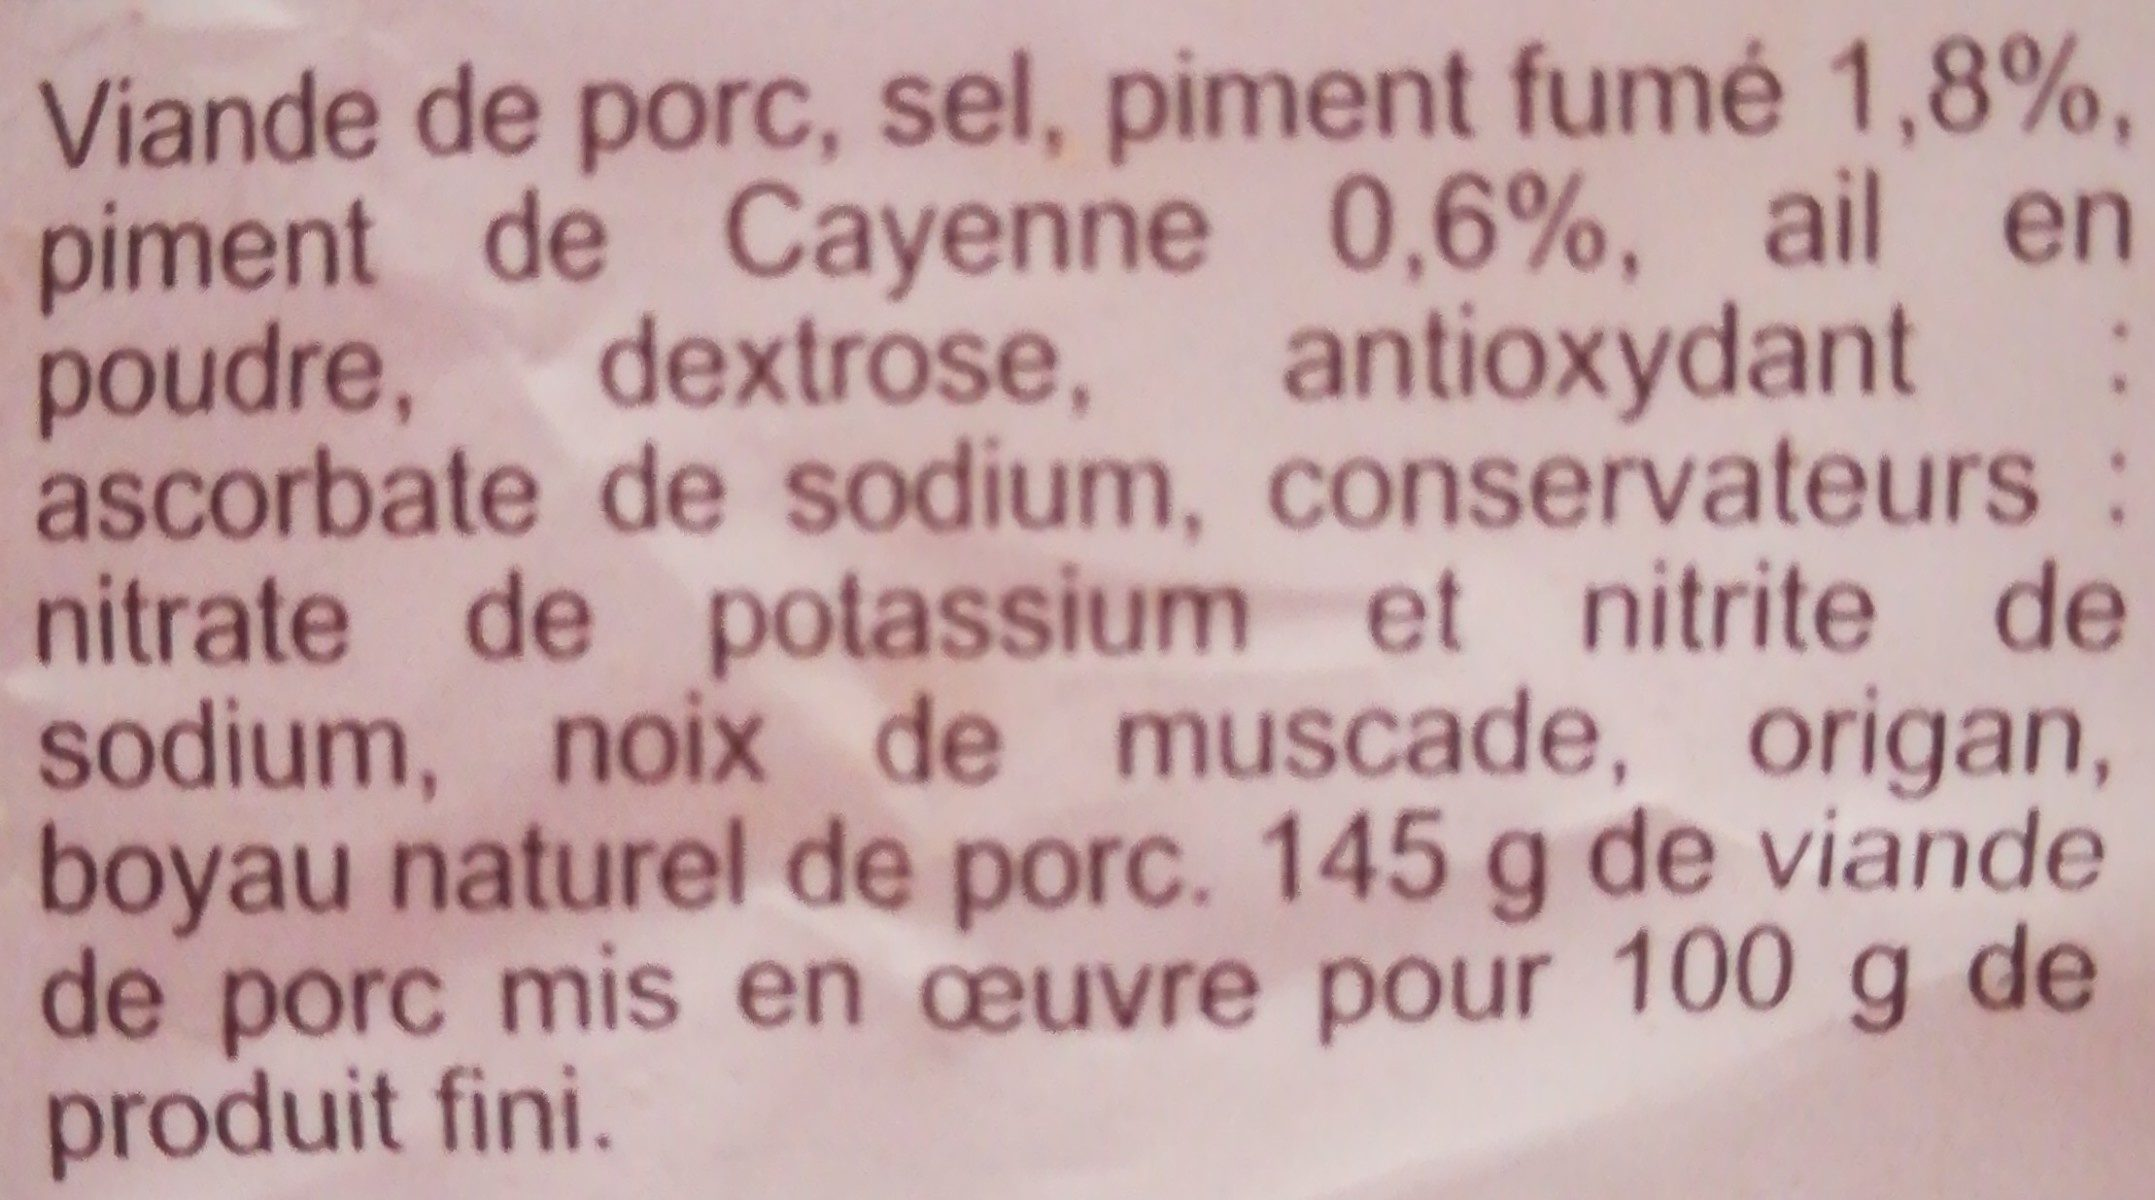 Chorizo origine Espagne (Fort) 2,07€ - Ingrediënten